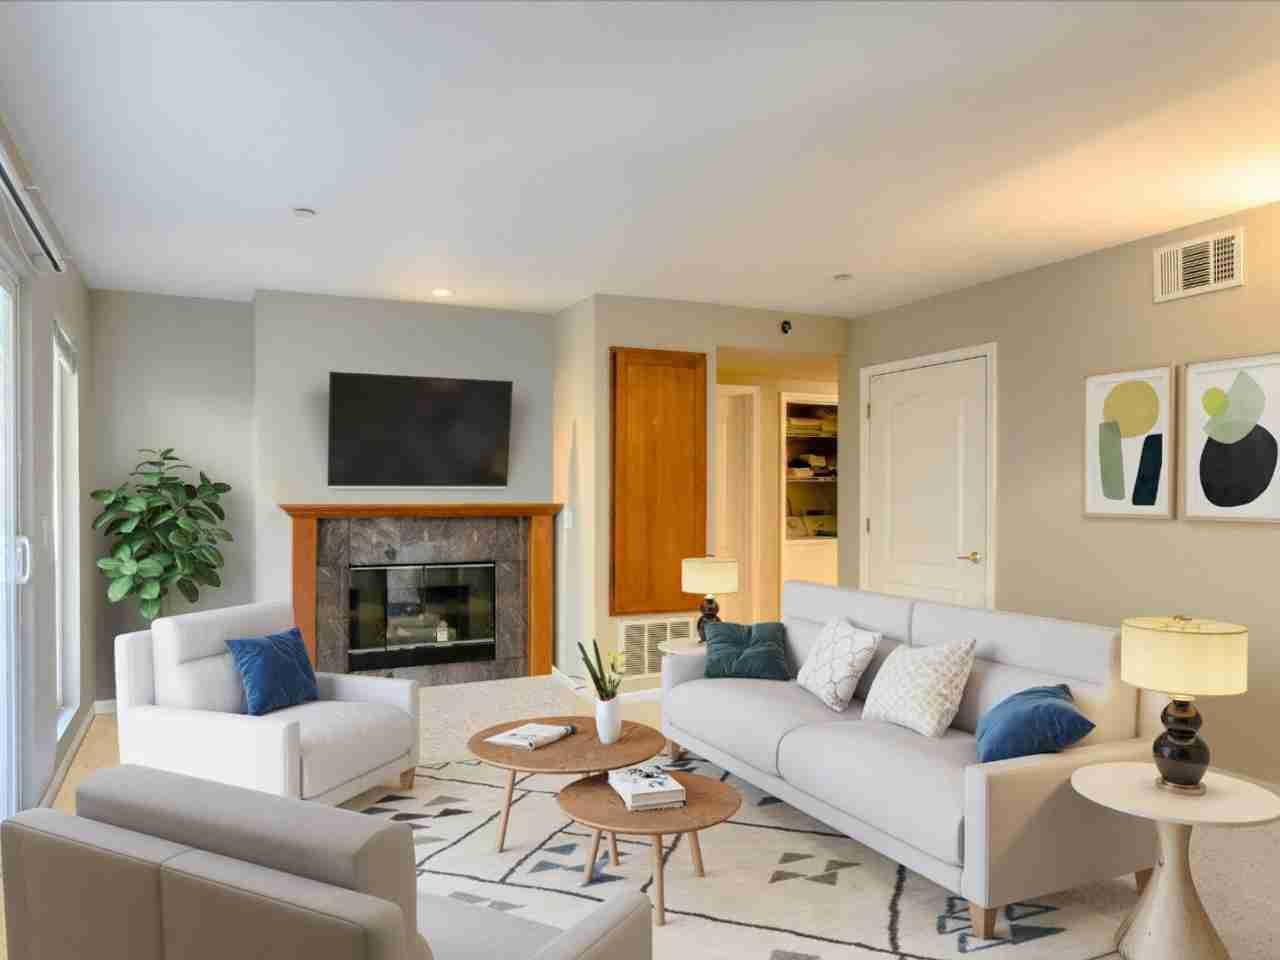 Sunny Living Room, 3875 Carter Drive #106 South San Francisco, CA, 94080